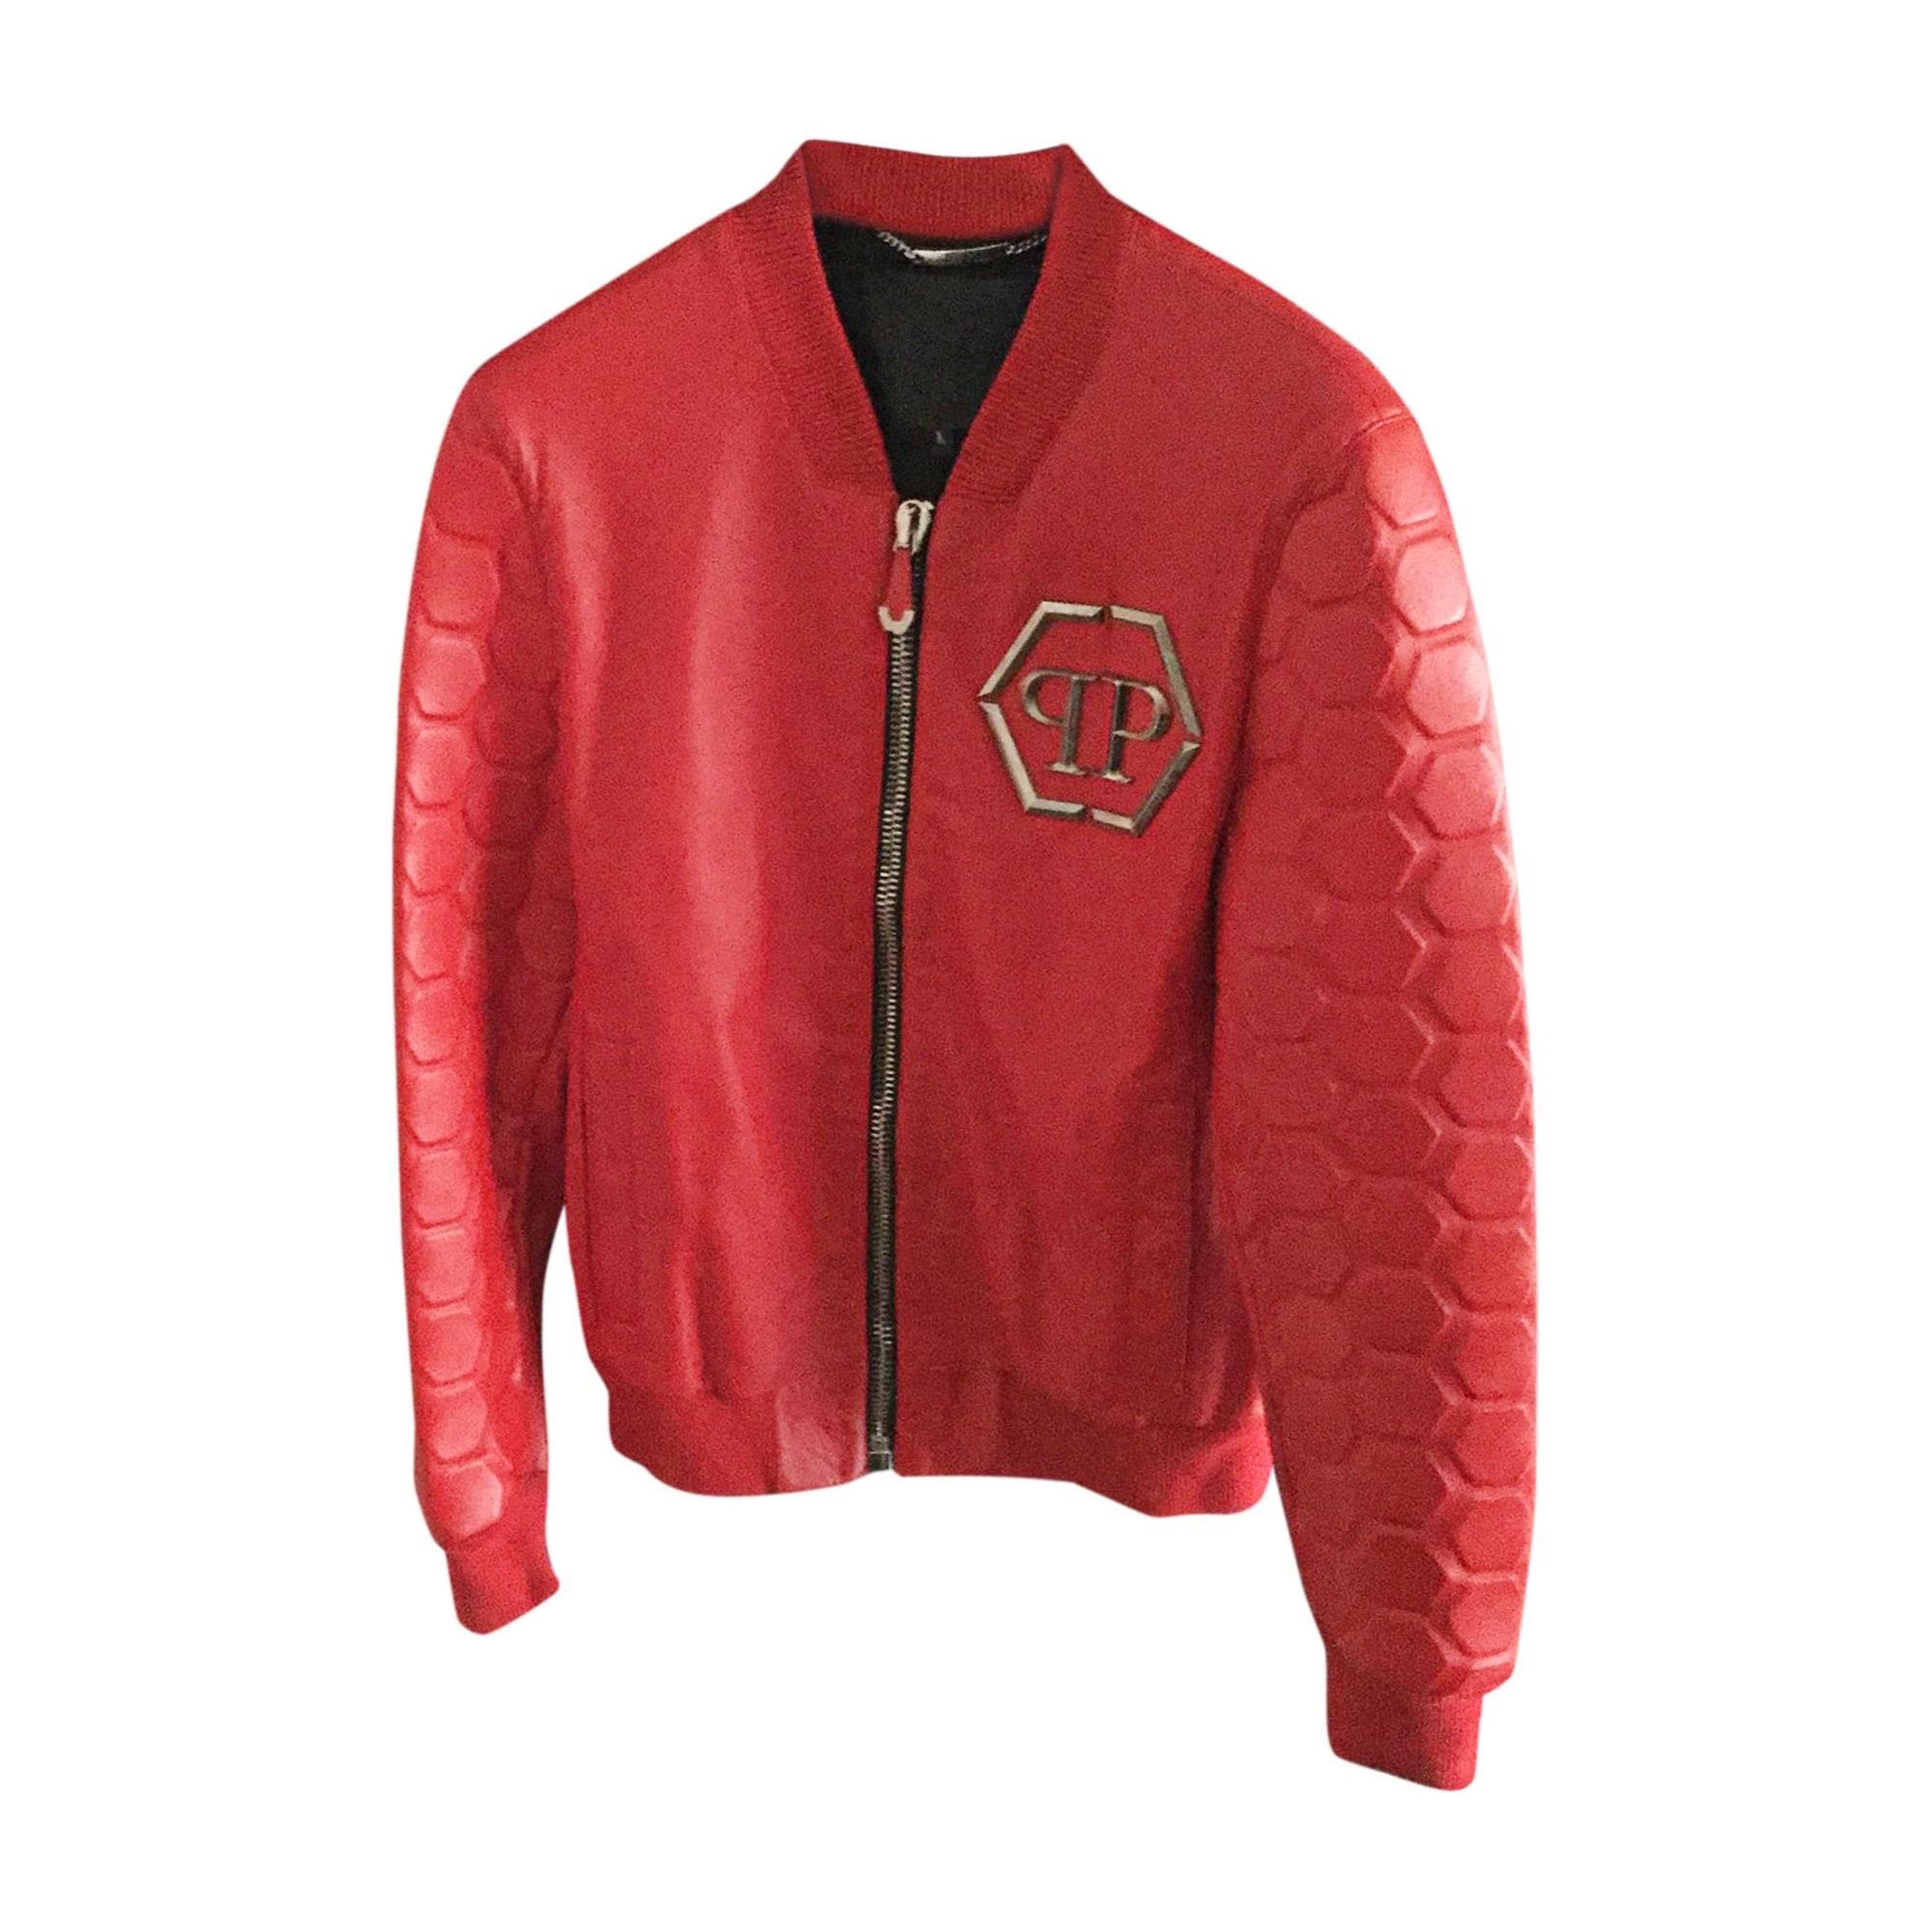 Veste en cuir PHILIPP PLEIN 52 (L) rouge